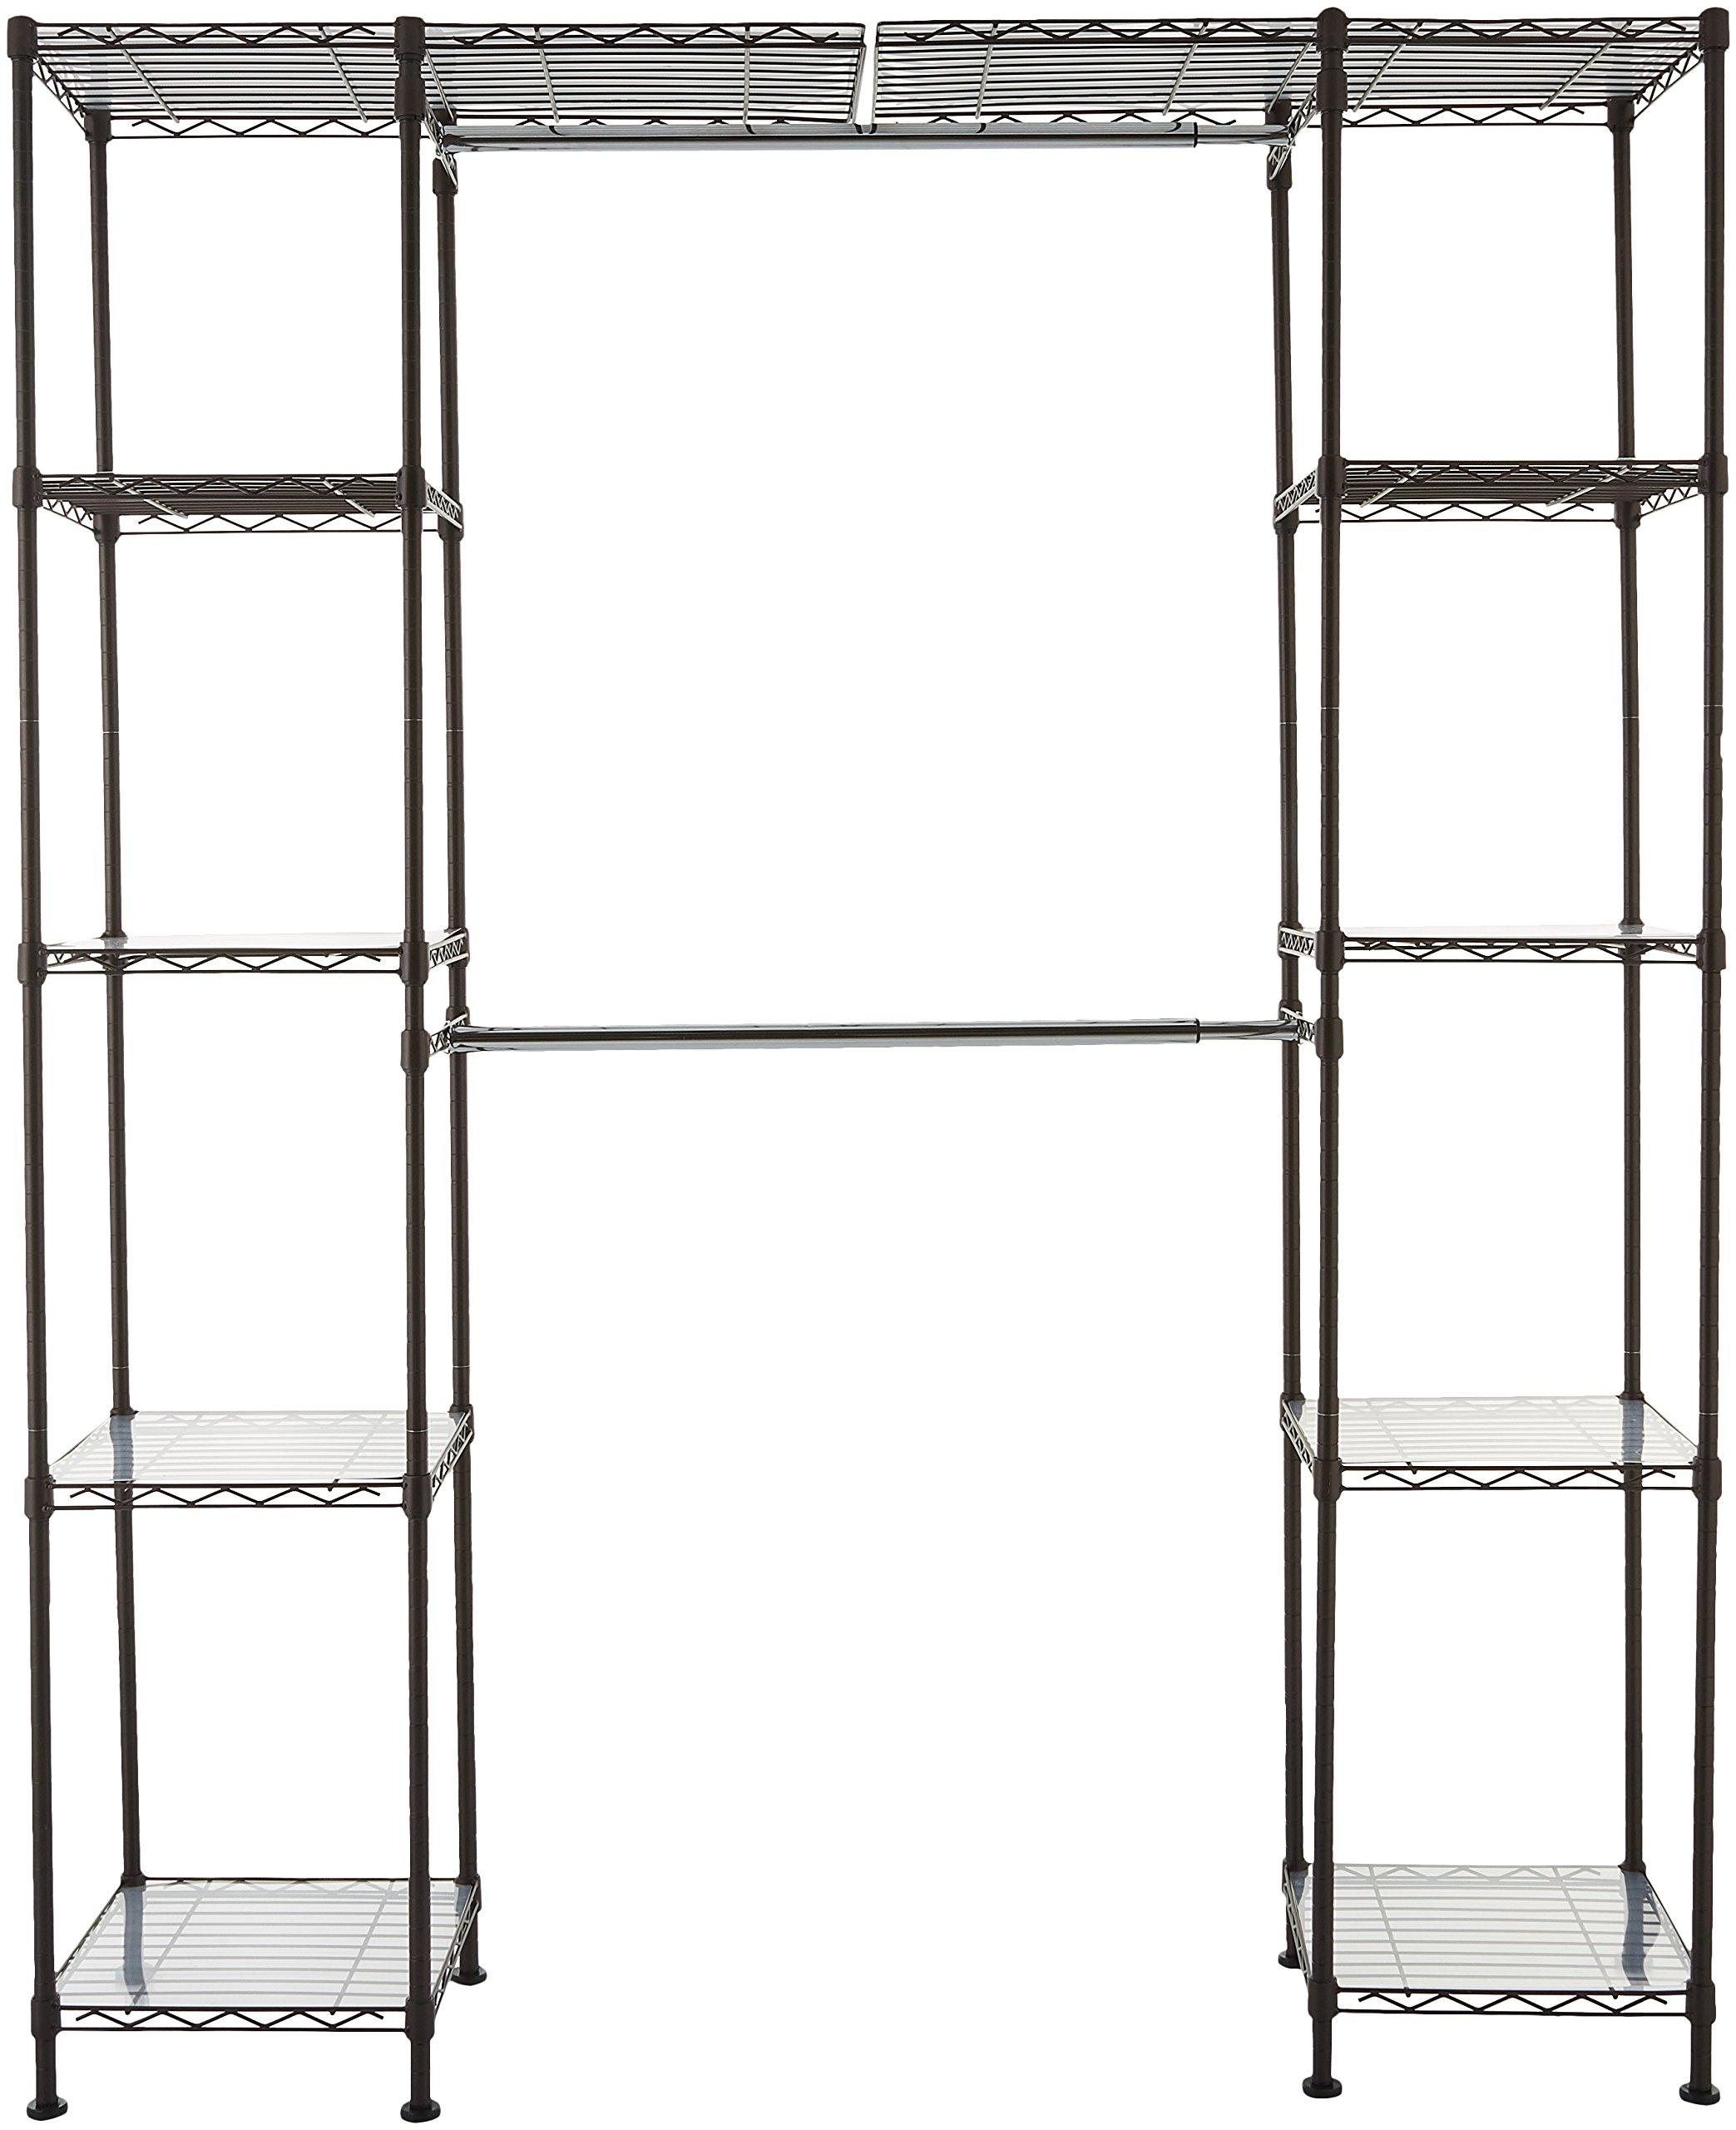 AmazonBasics Expandable Closet Organizer - 14'' x 58'' Expands to 63'' x 72'', Bronze